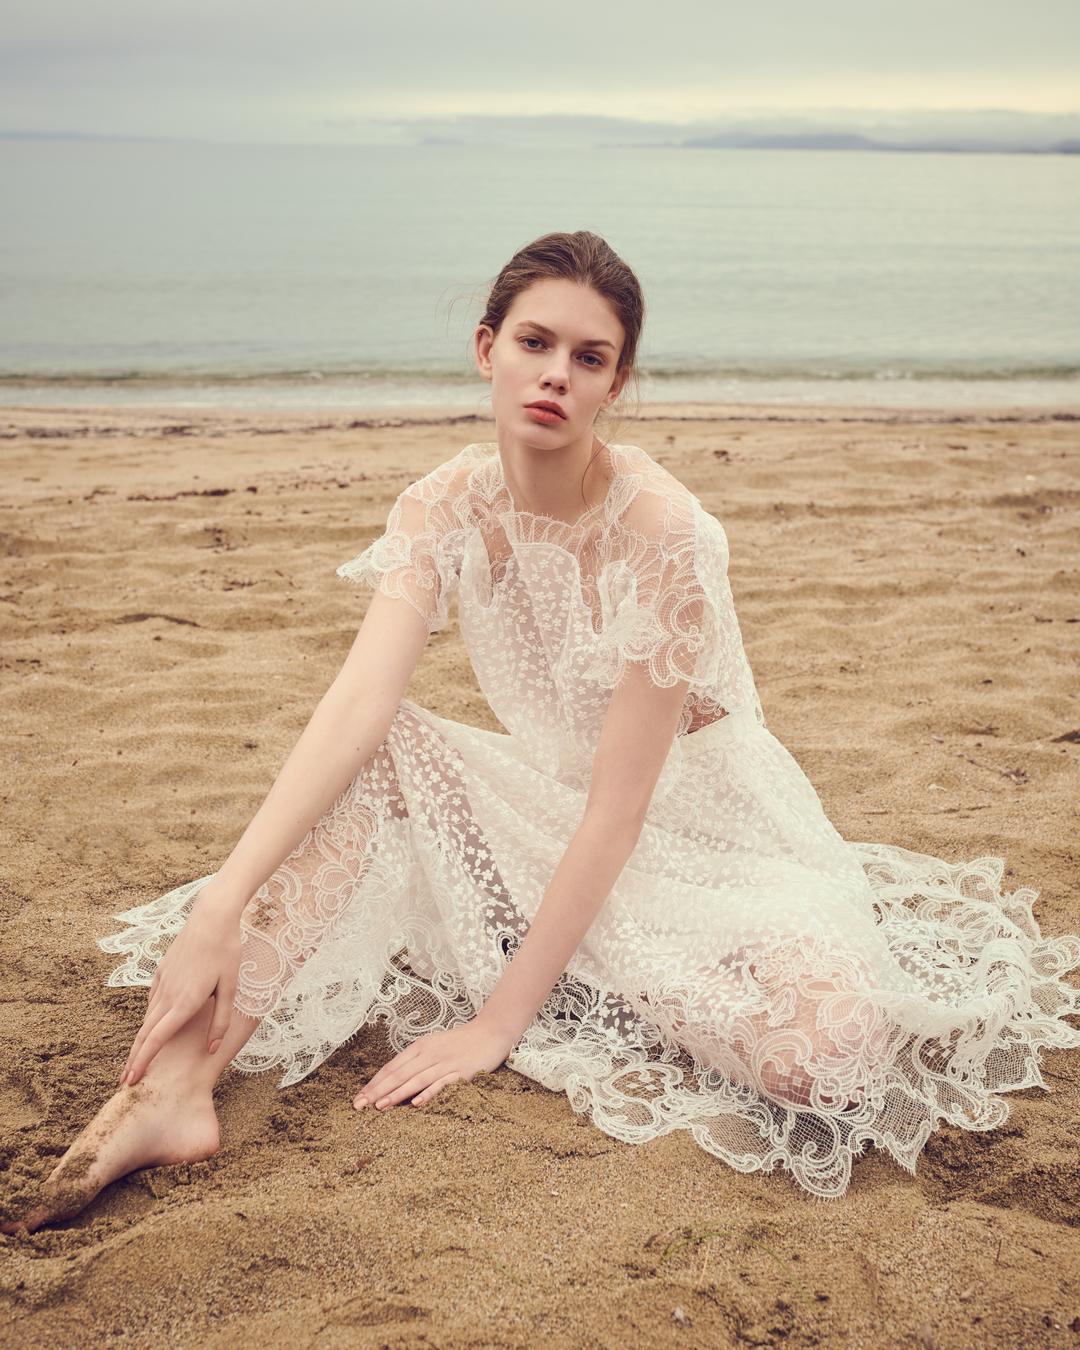 elektra skirt dress photo